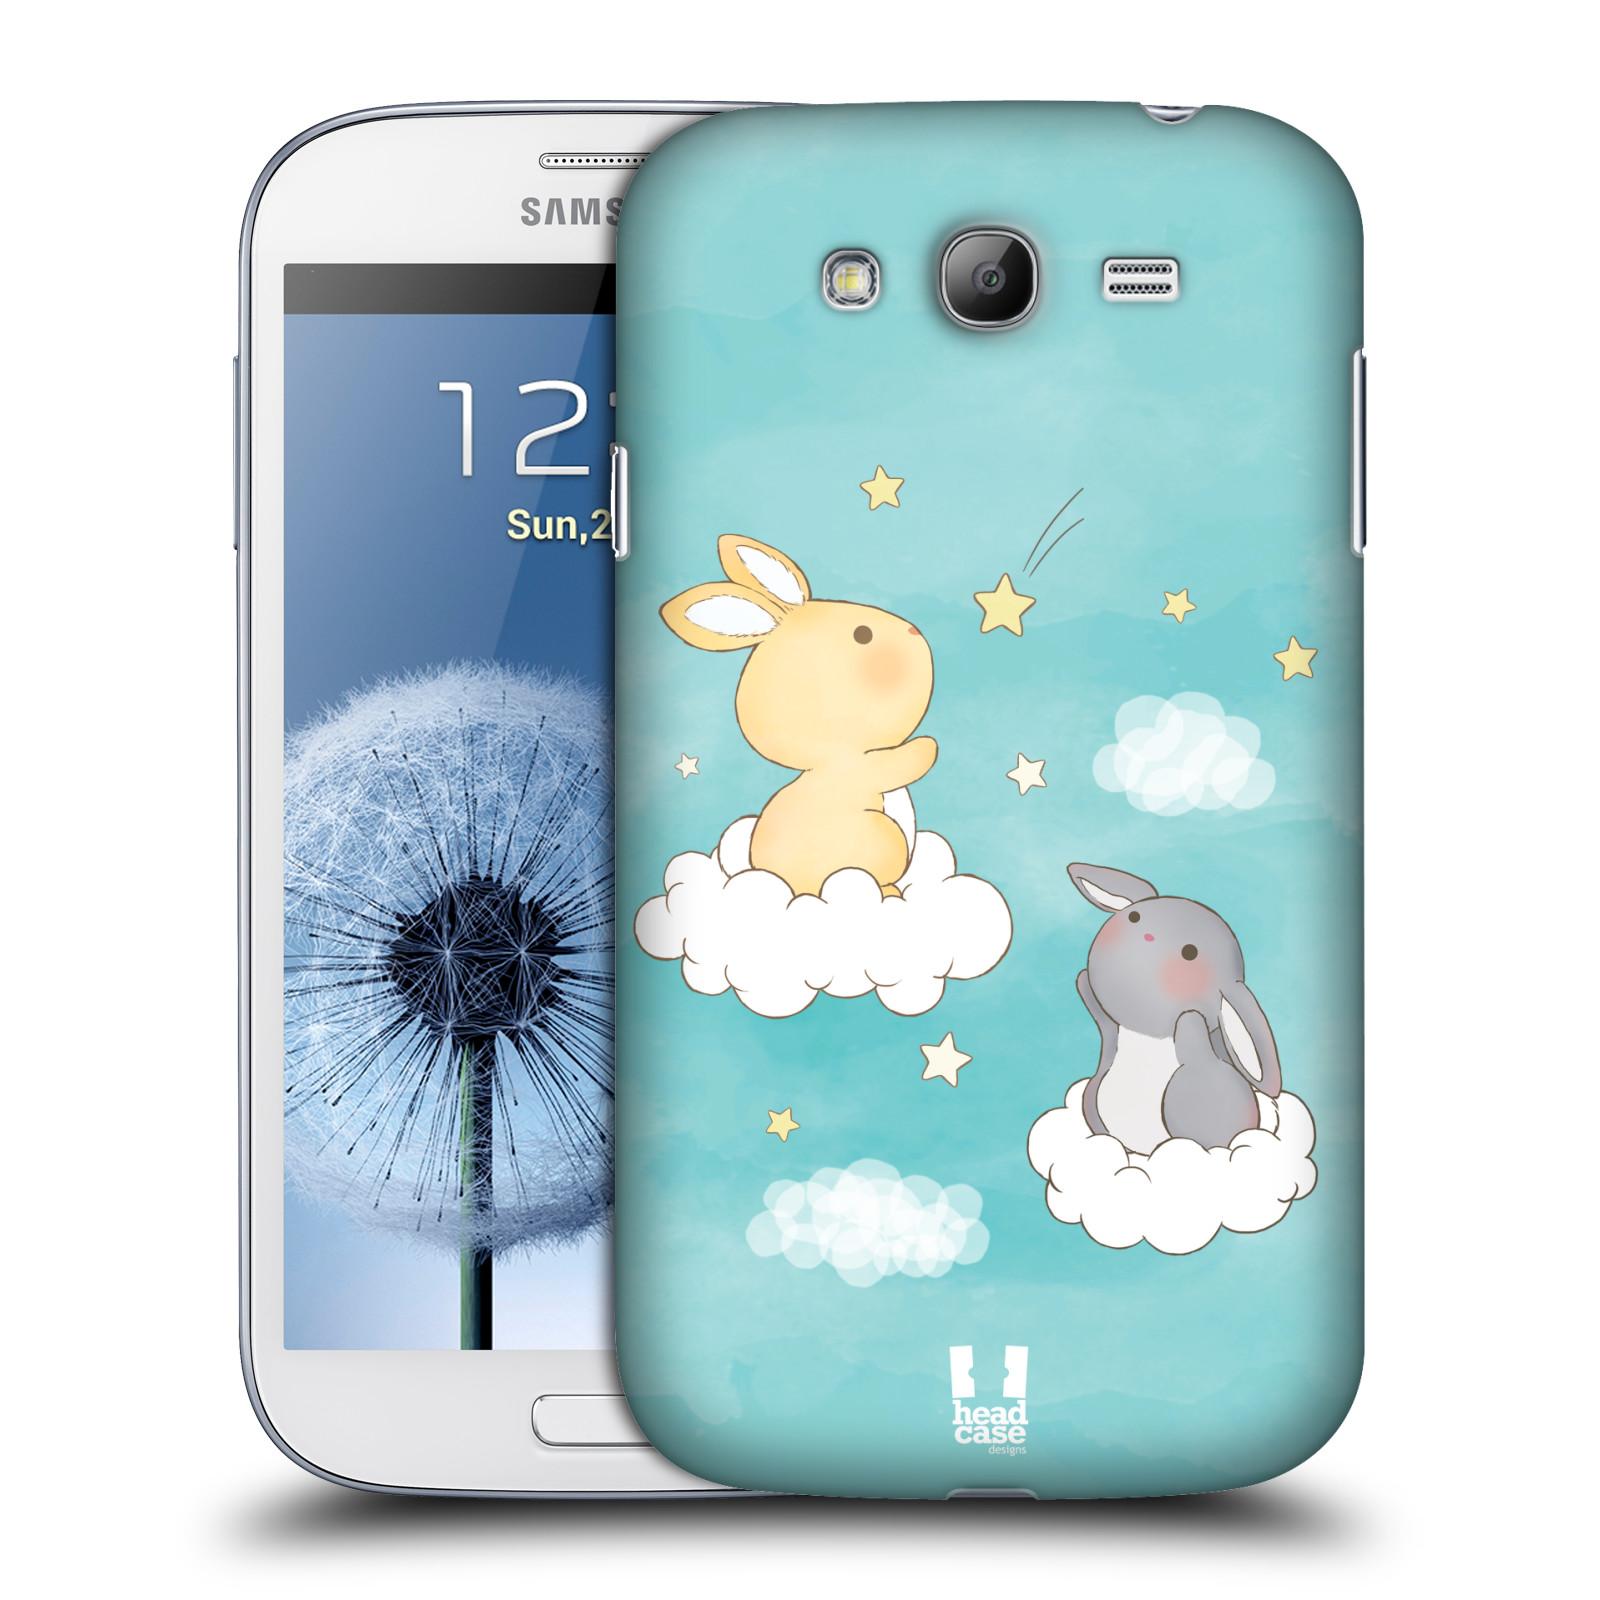 HEAD CASE plastový obal na mobil SAMSUNG GALAXY Grand i9080 vzor králíček a hvězdy modrá